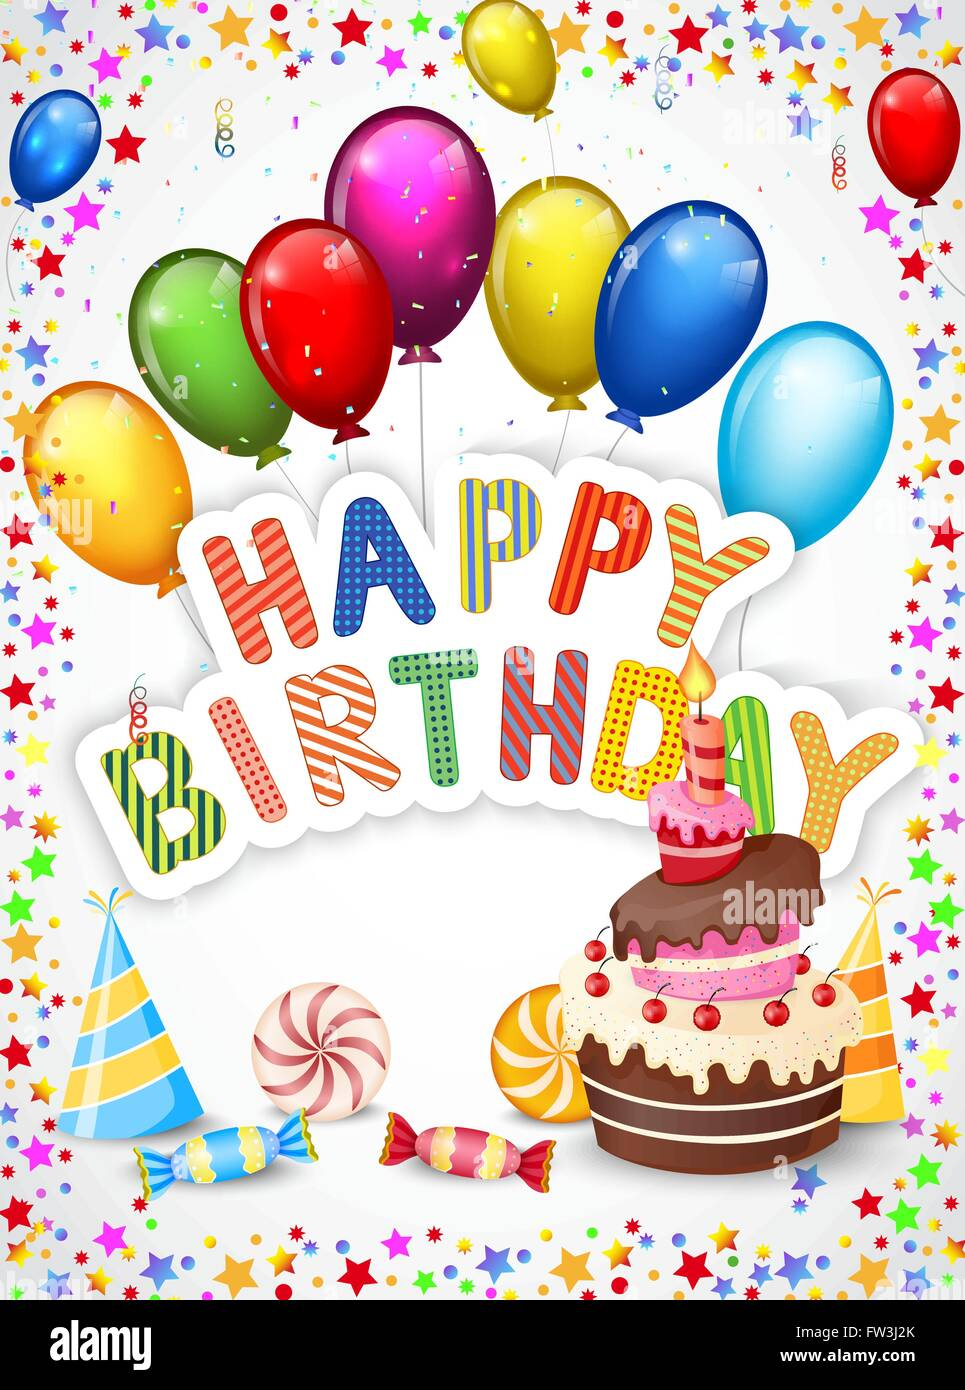 Birthday Cartoon With Colorful Balloon And Birthday Cake Stock Vector Image Art Alamy